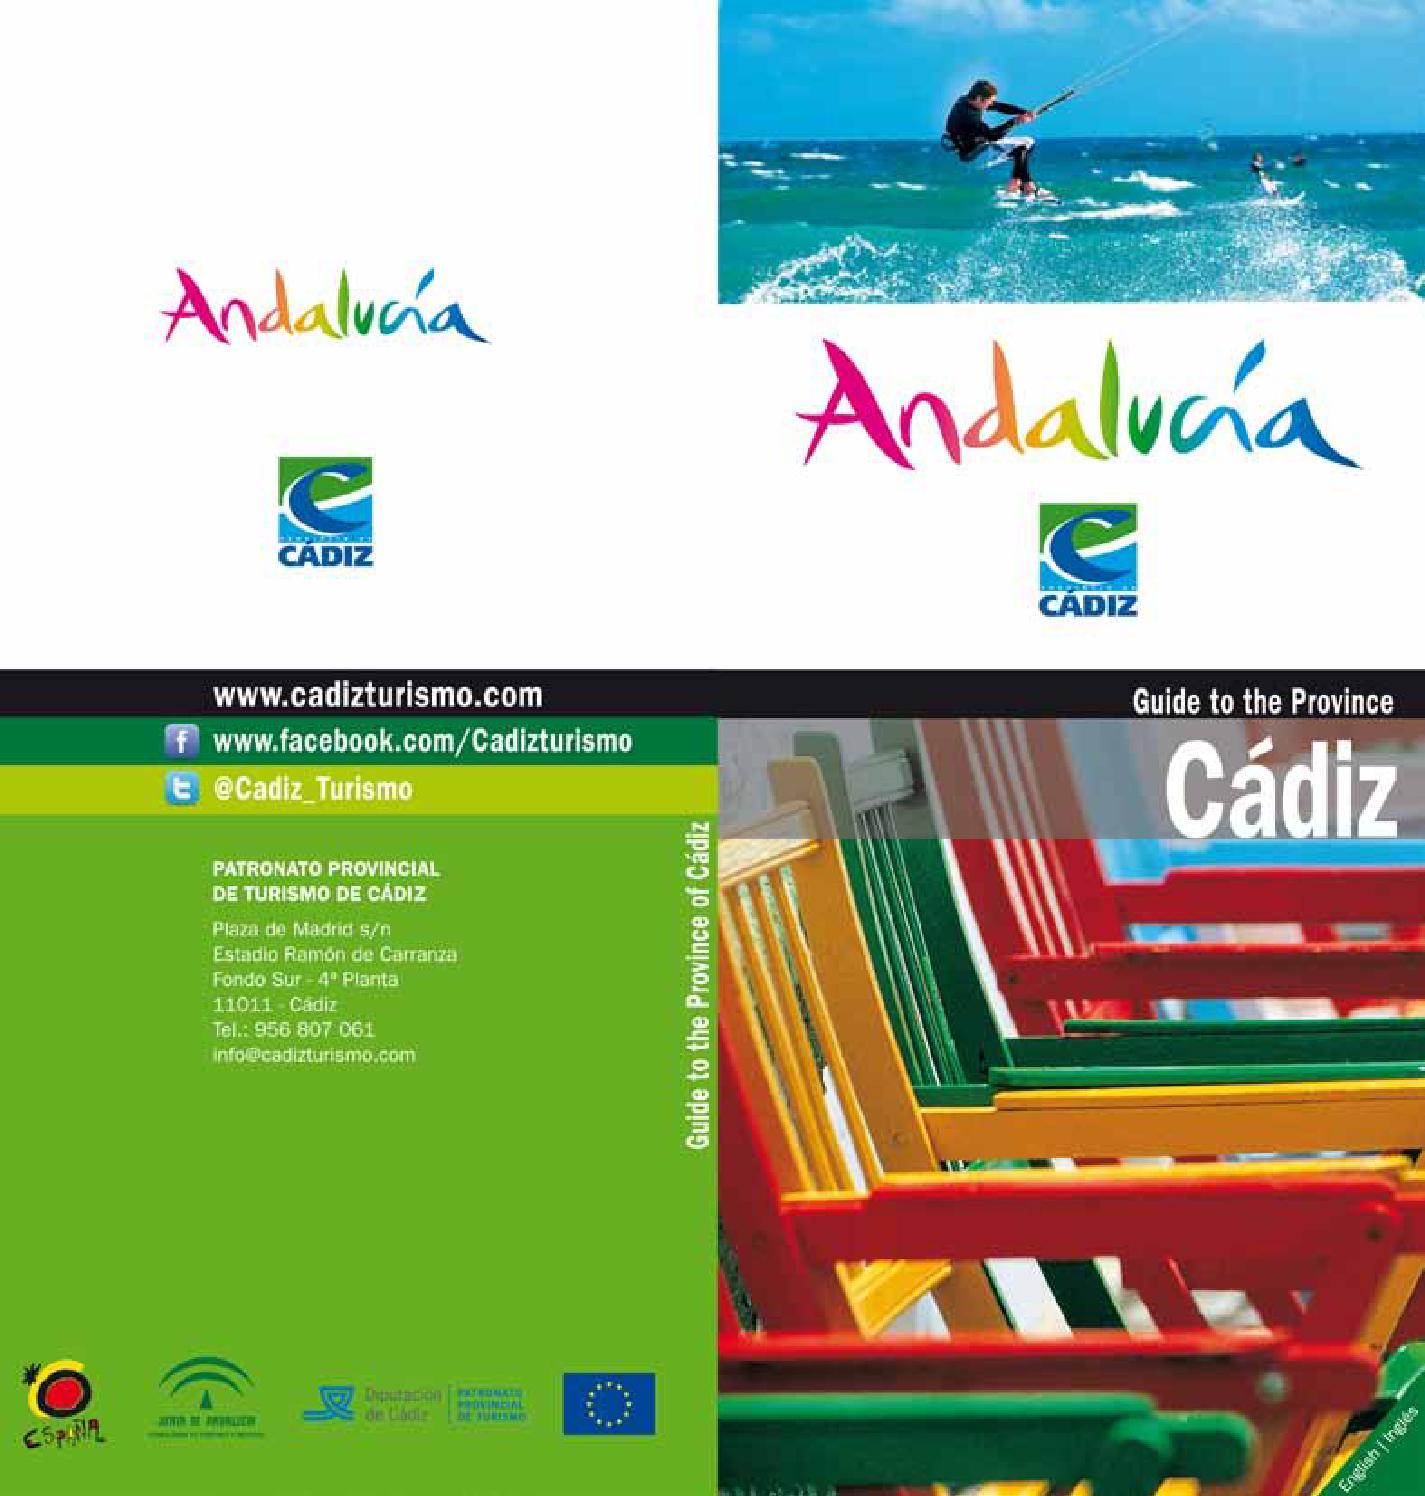 Guide To The Province Cadiz By Patronato Provincial Turismo De  # Muebles Lola Mora Bahia Blanca